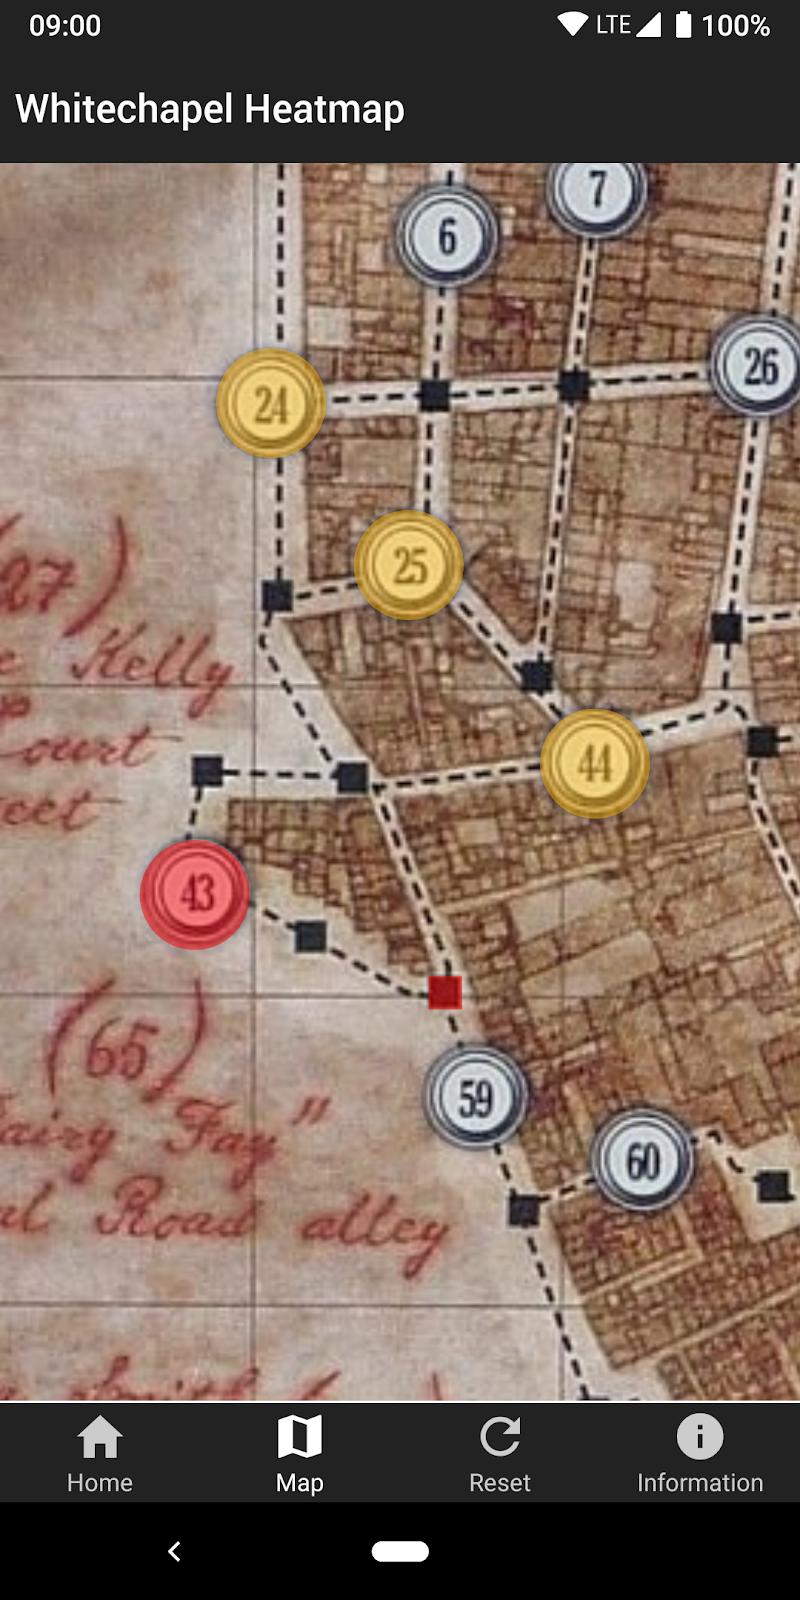 Whitechapel Heatmap Screenshot 3